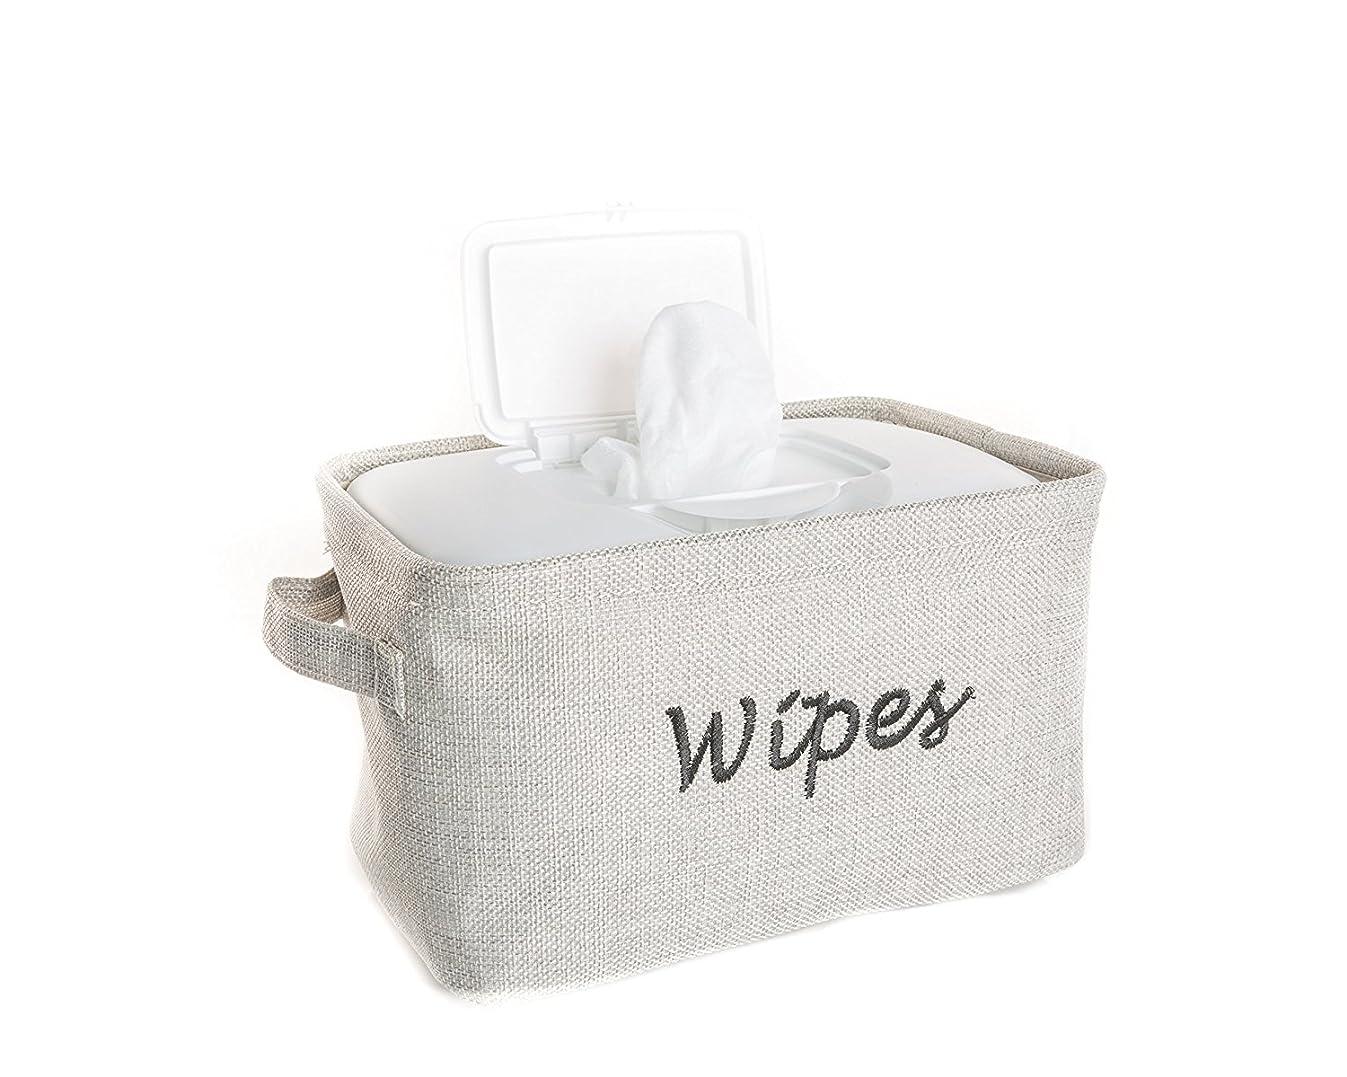 Dejaroo Baby Wipe Storage Bin - Nursery Organizer Caddy - Embroidered Eco-friendly Grey Linen (GREY)